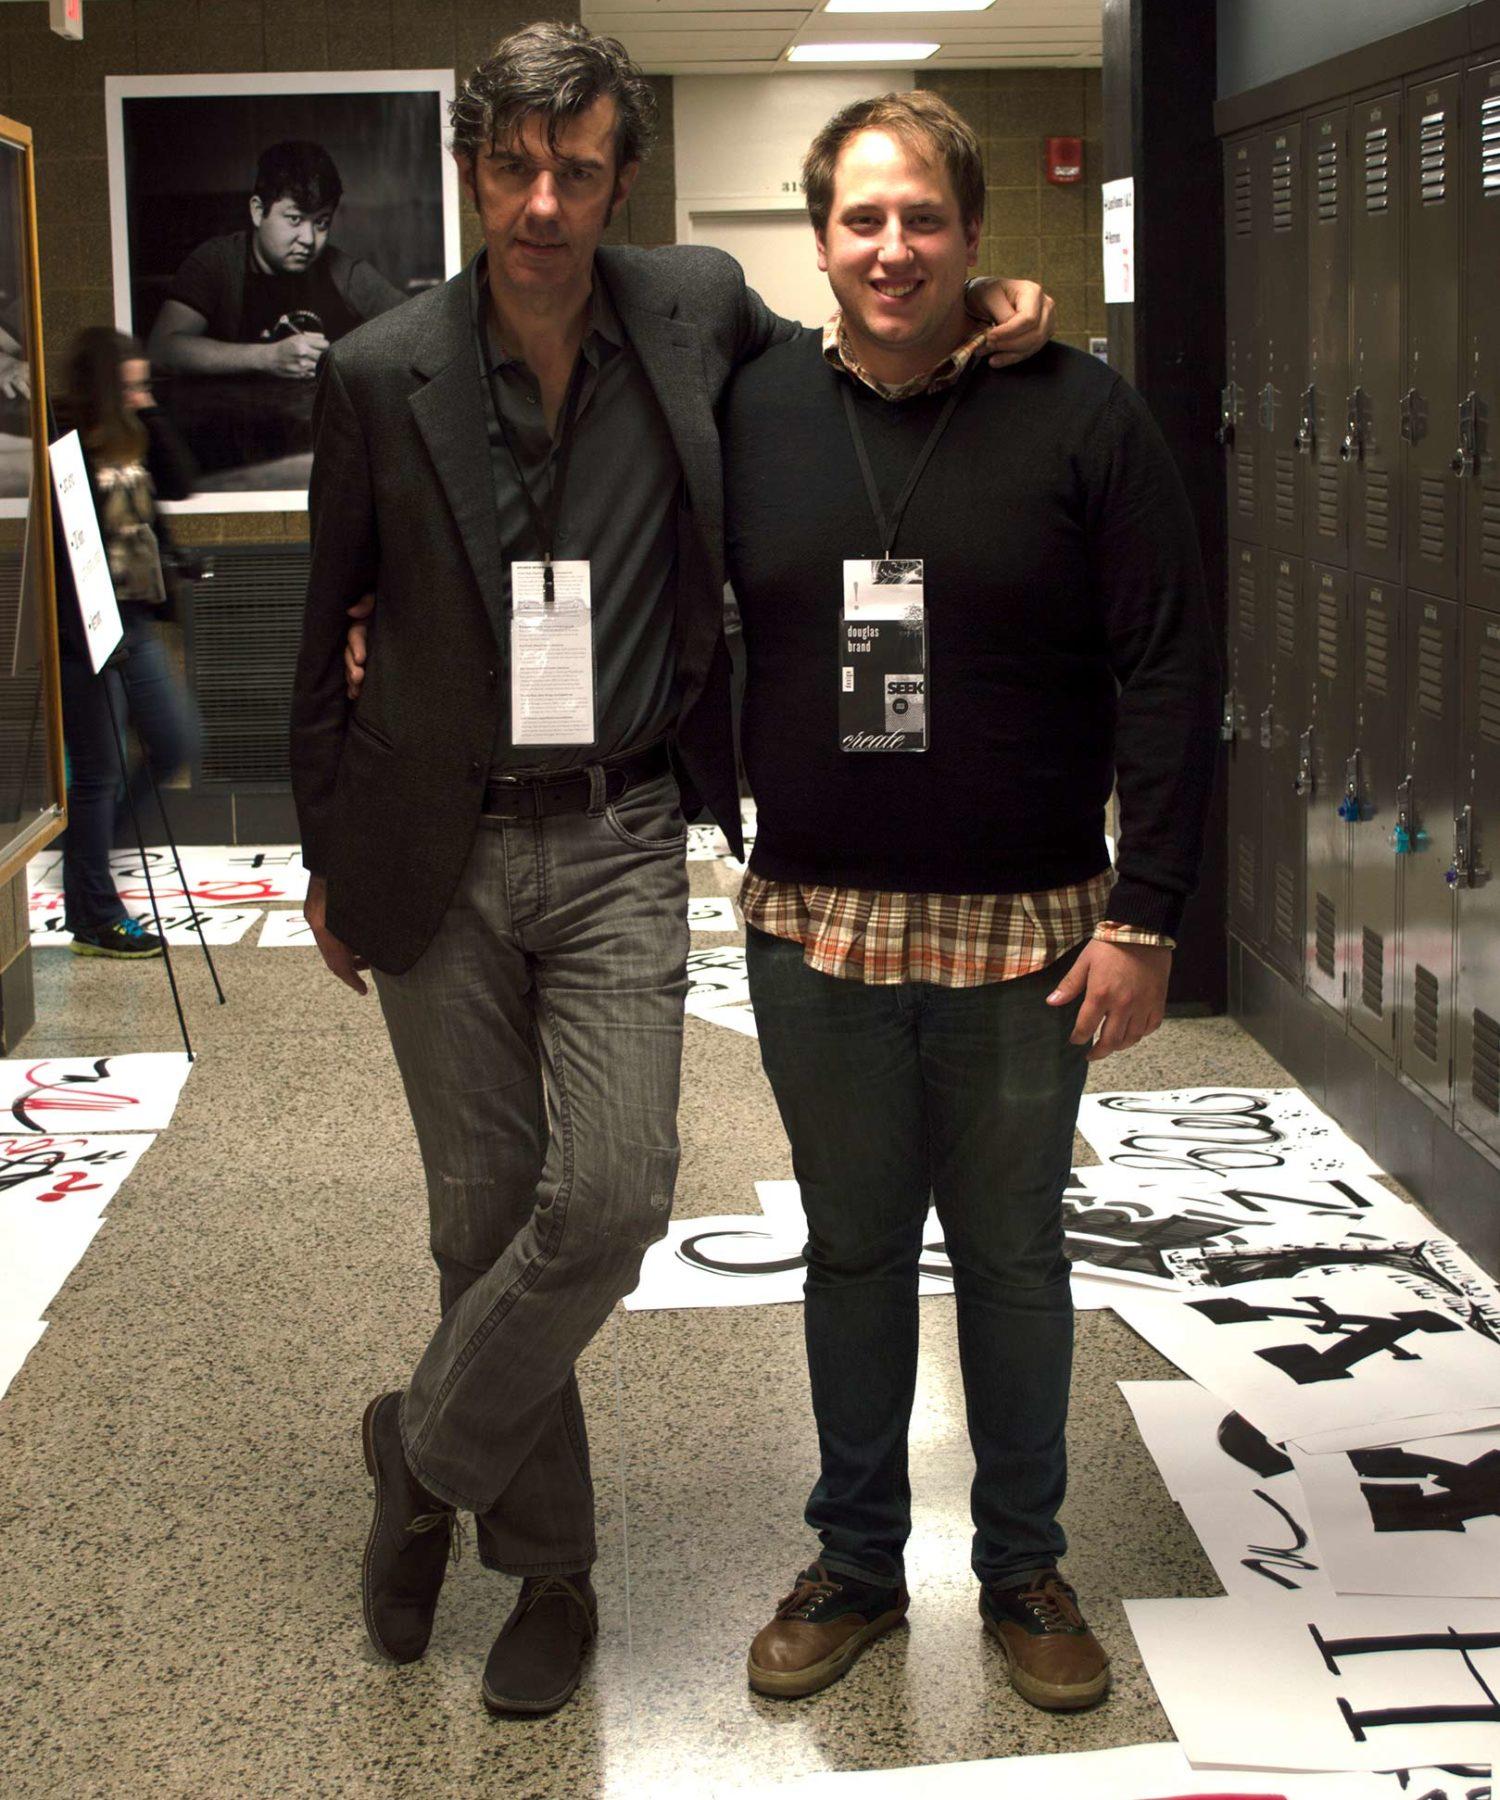 Stefan Sagmeister and then student coordinator, Doug Brand